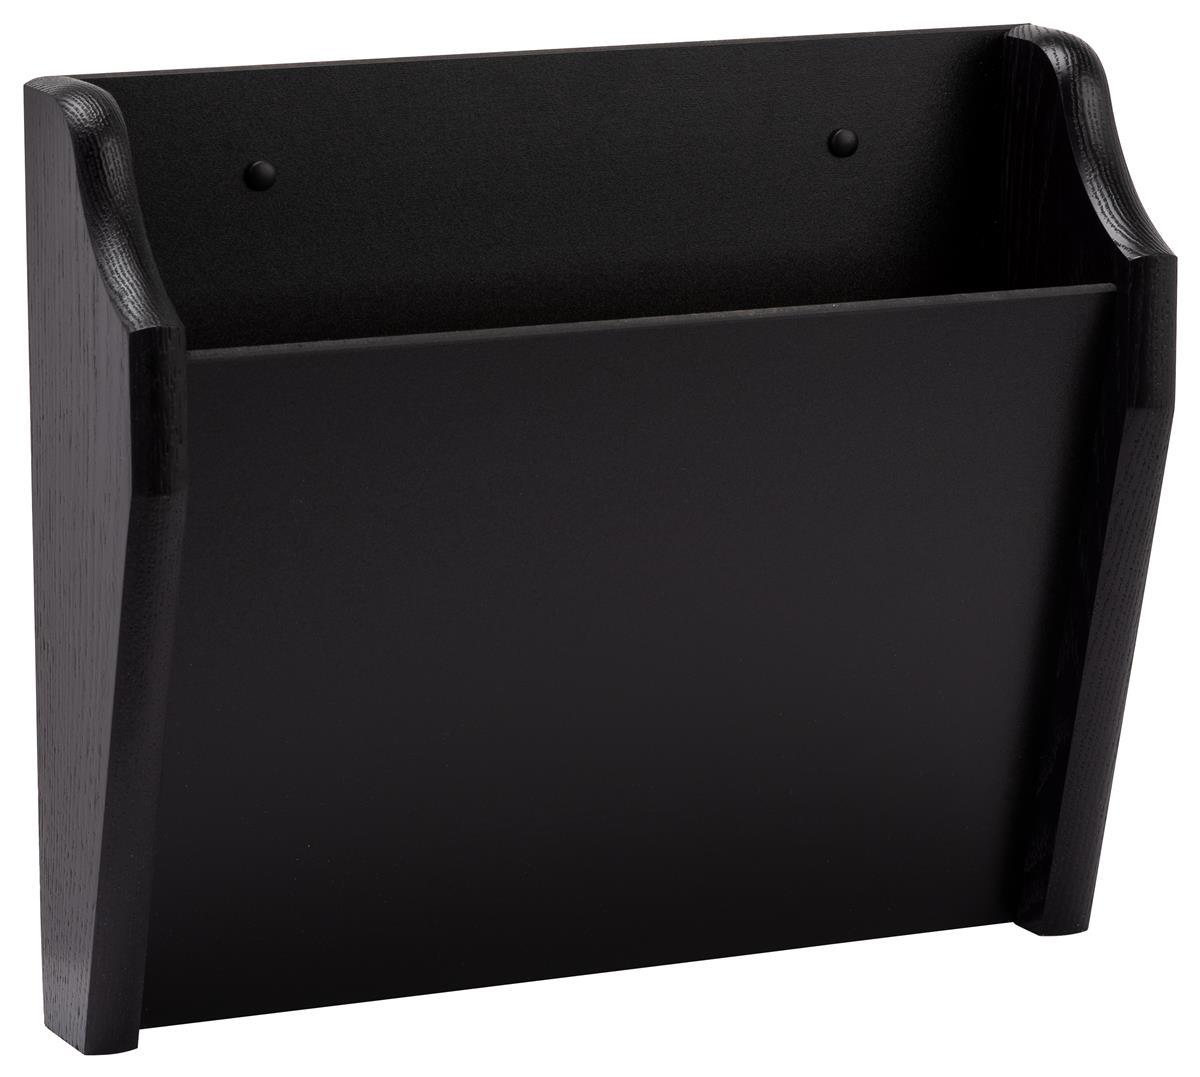 Single Pocket Wooden Wall File Holder Sleek Black Wood Finish